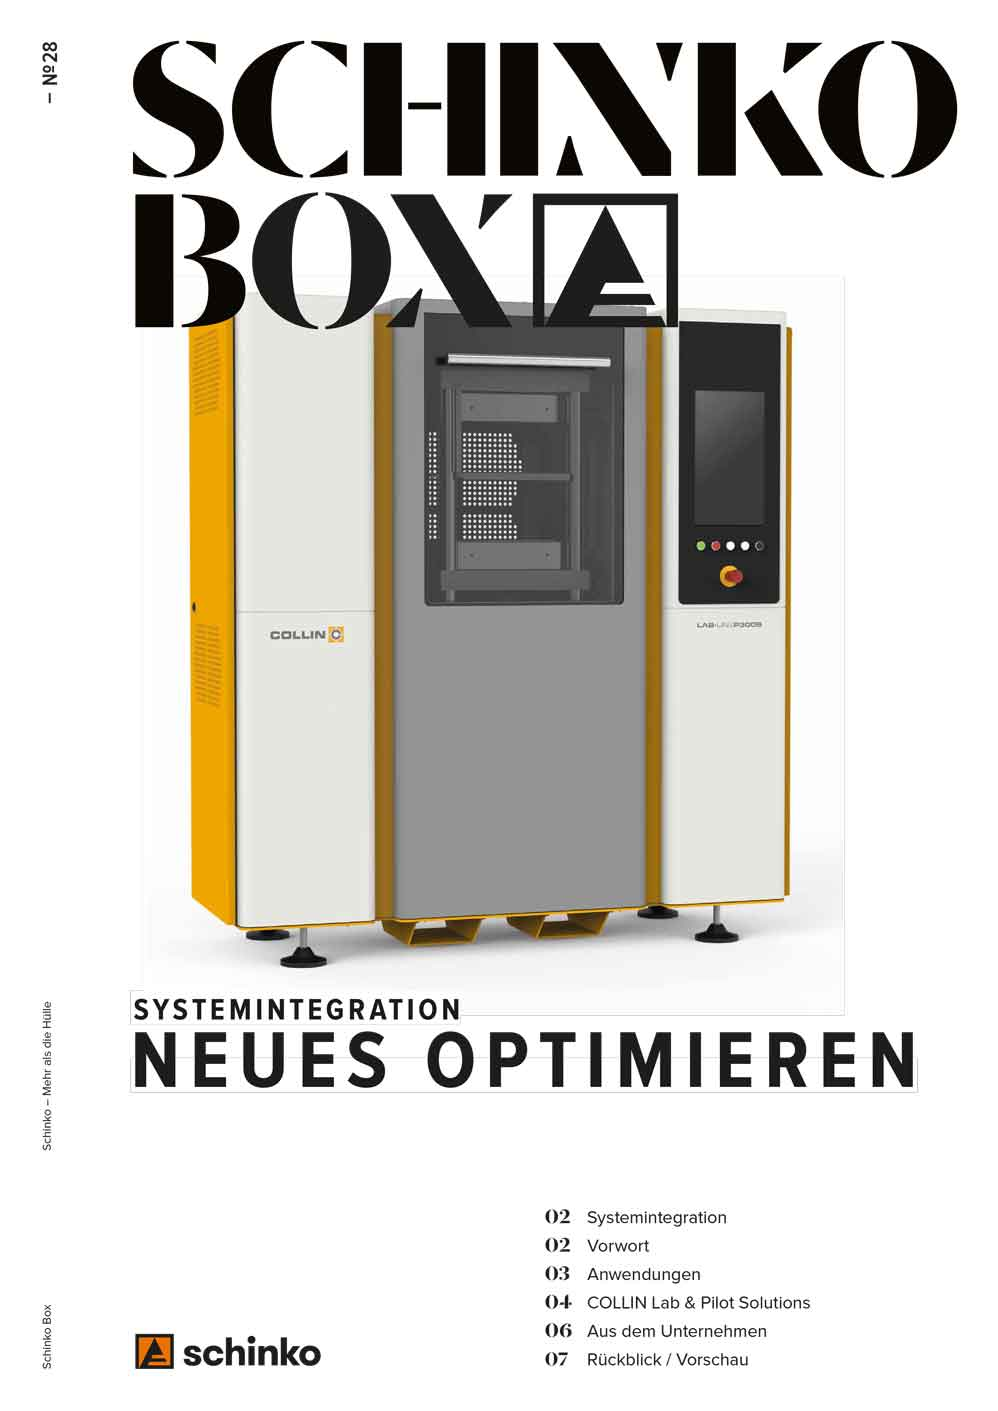 Schinko Box Nr. 28 Systemintegration – Neues optimieren - Schinko Box Nr. 28 Systemintegration – Neues optimieren